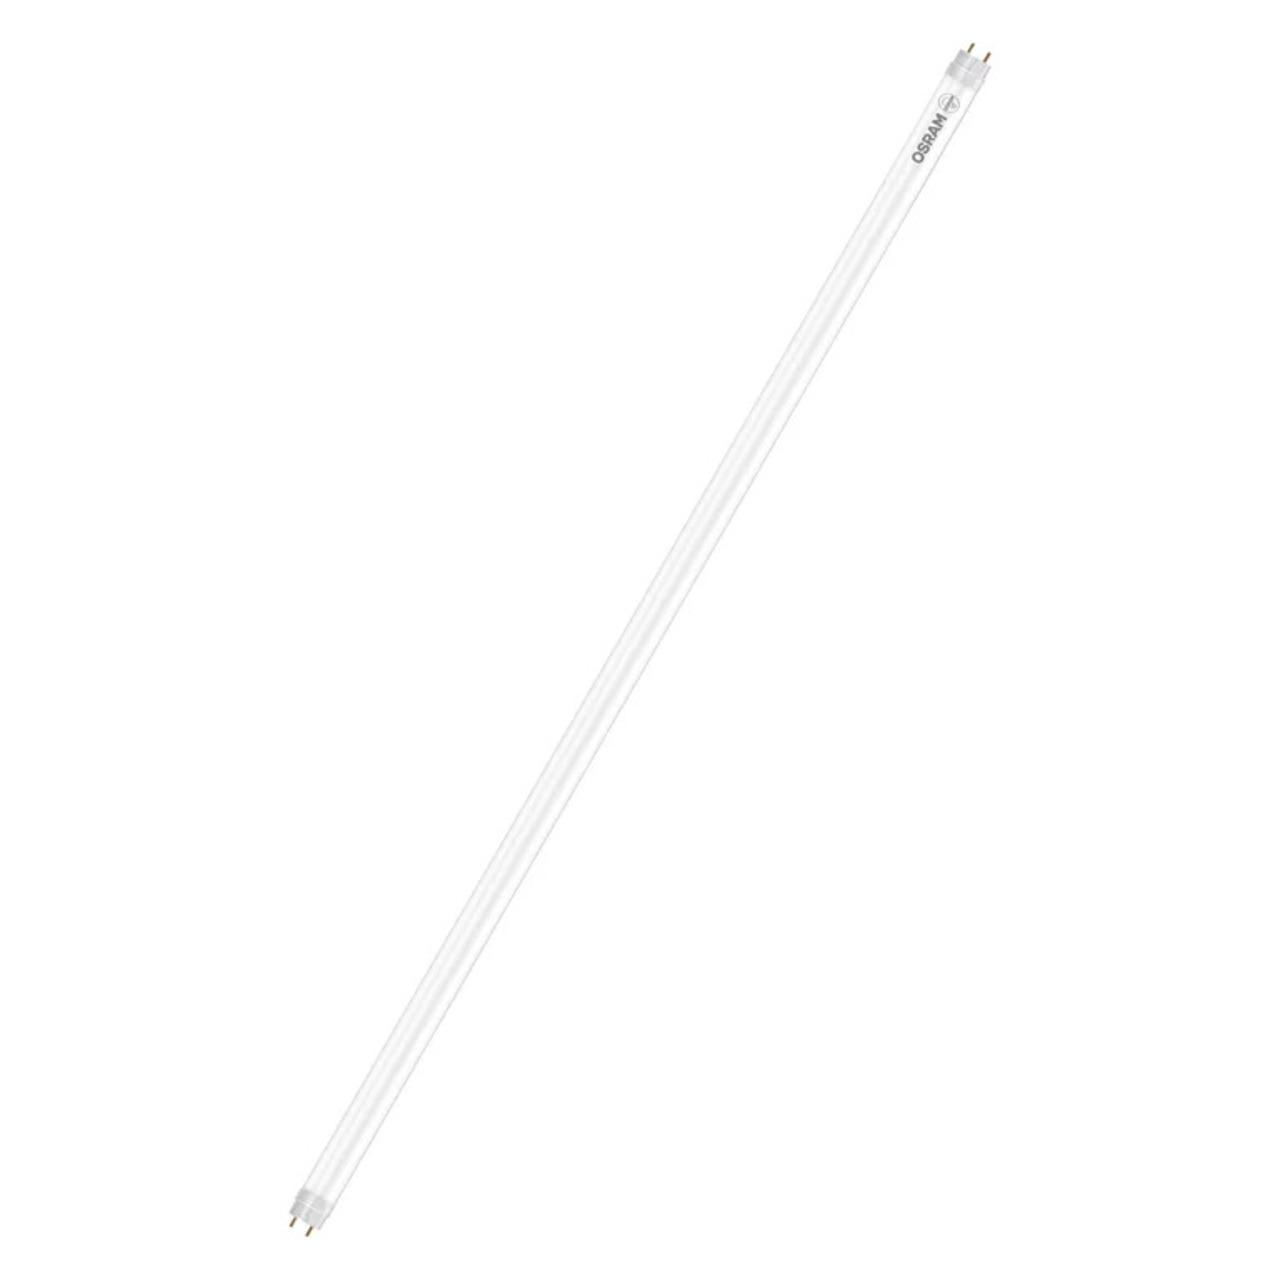 OSRAM 16-2-W-T8-LED-Röhrenlampe 120 cm- kaltweiss